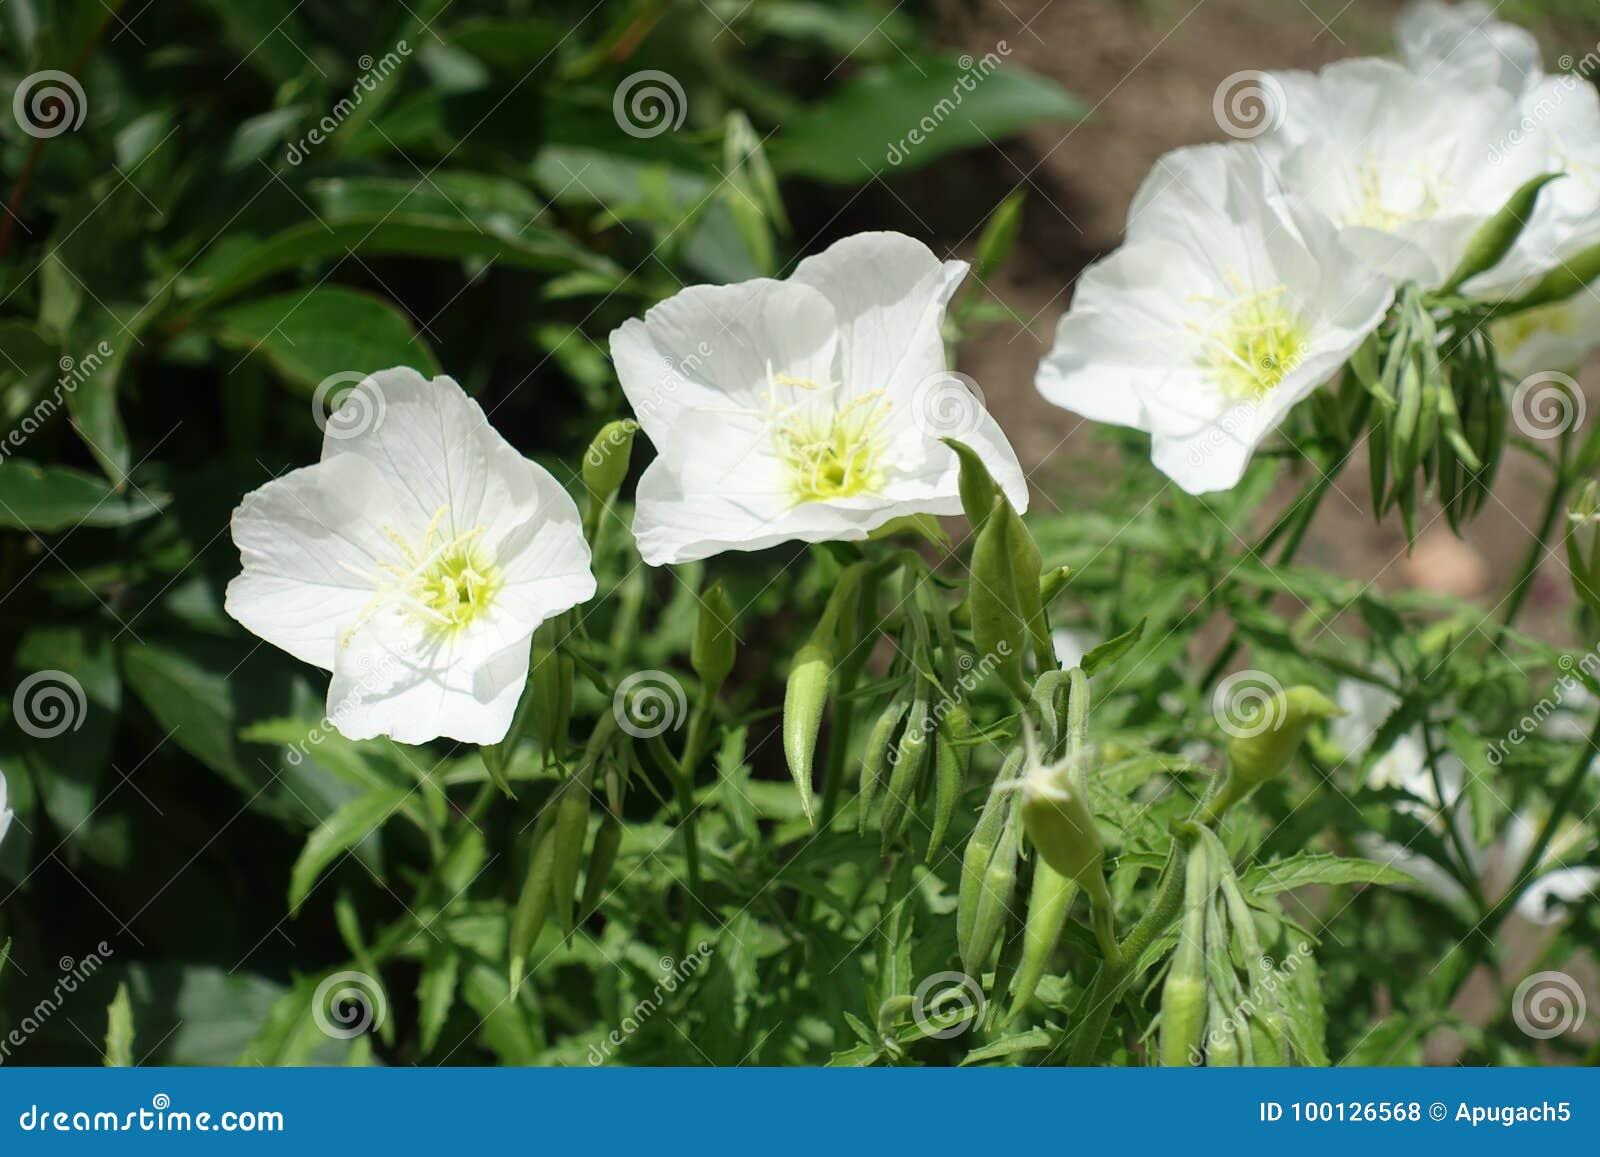 Pure white flowers of showy evening primrose stock photo image of pure white flowers of showy evening primrose mightylinksfo